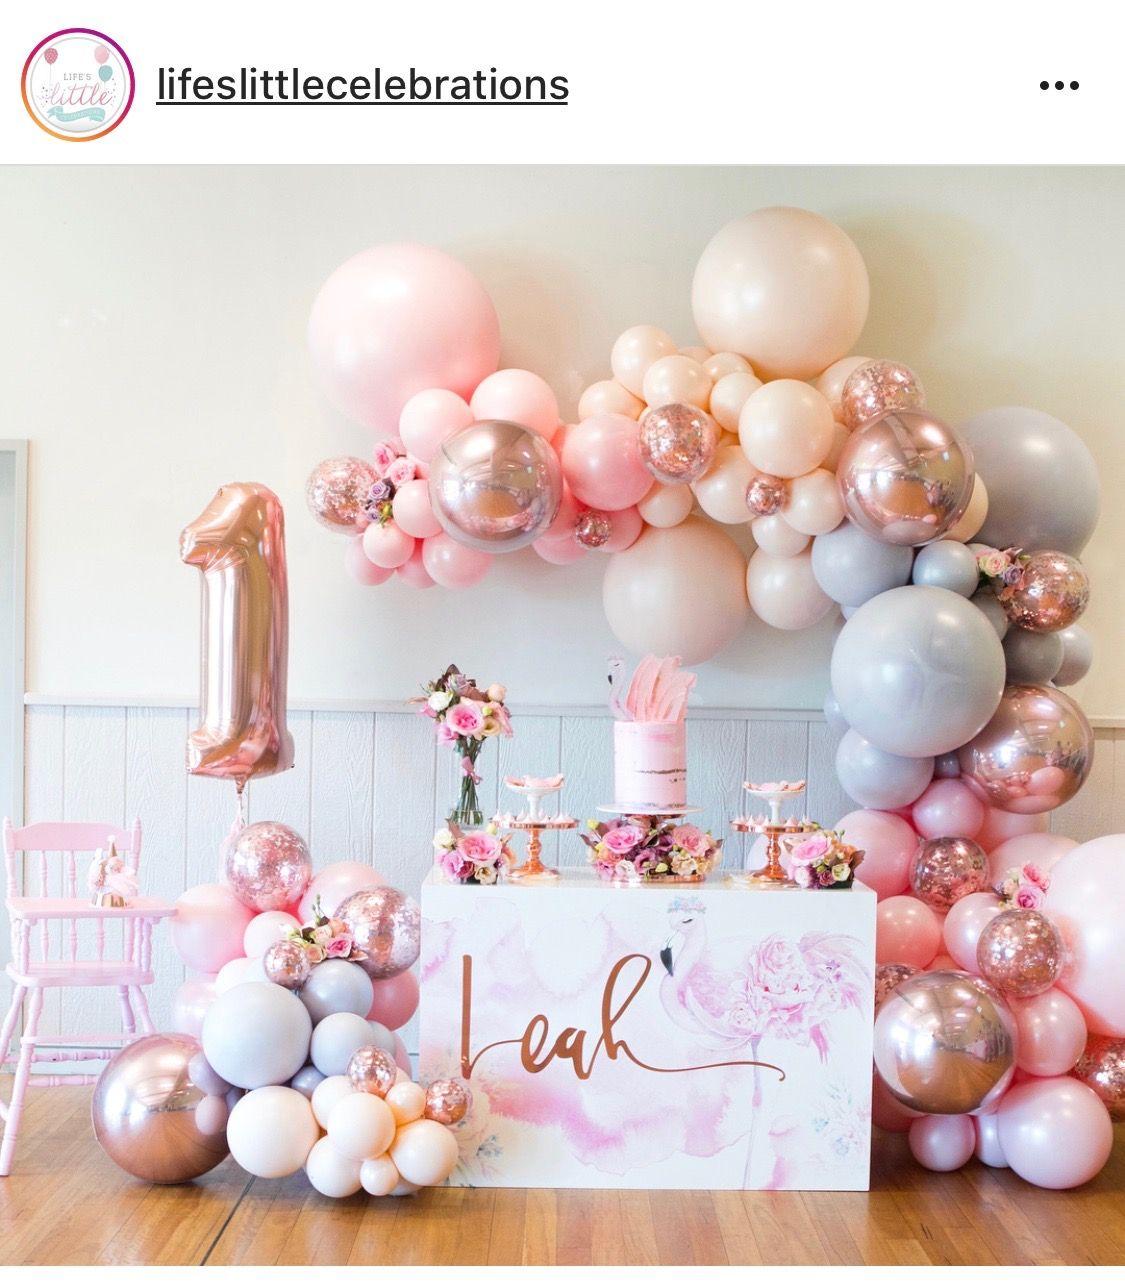 Pinterest †XIIXVIII† Festa de aniversario decoracao